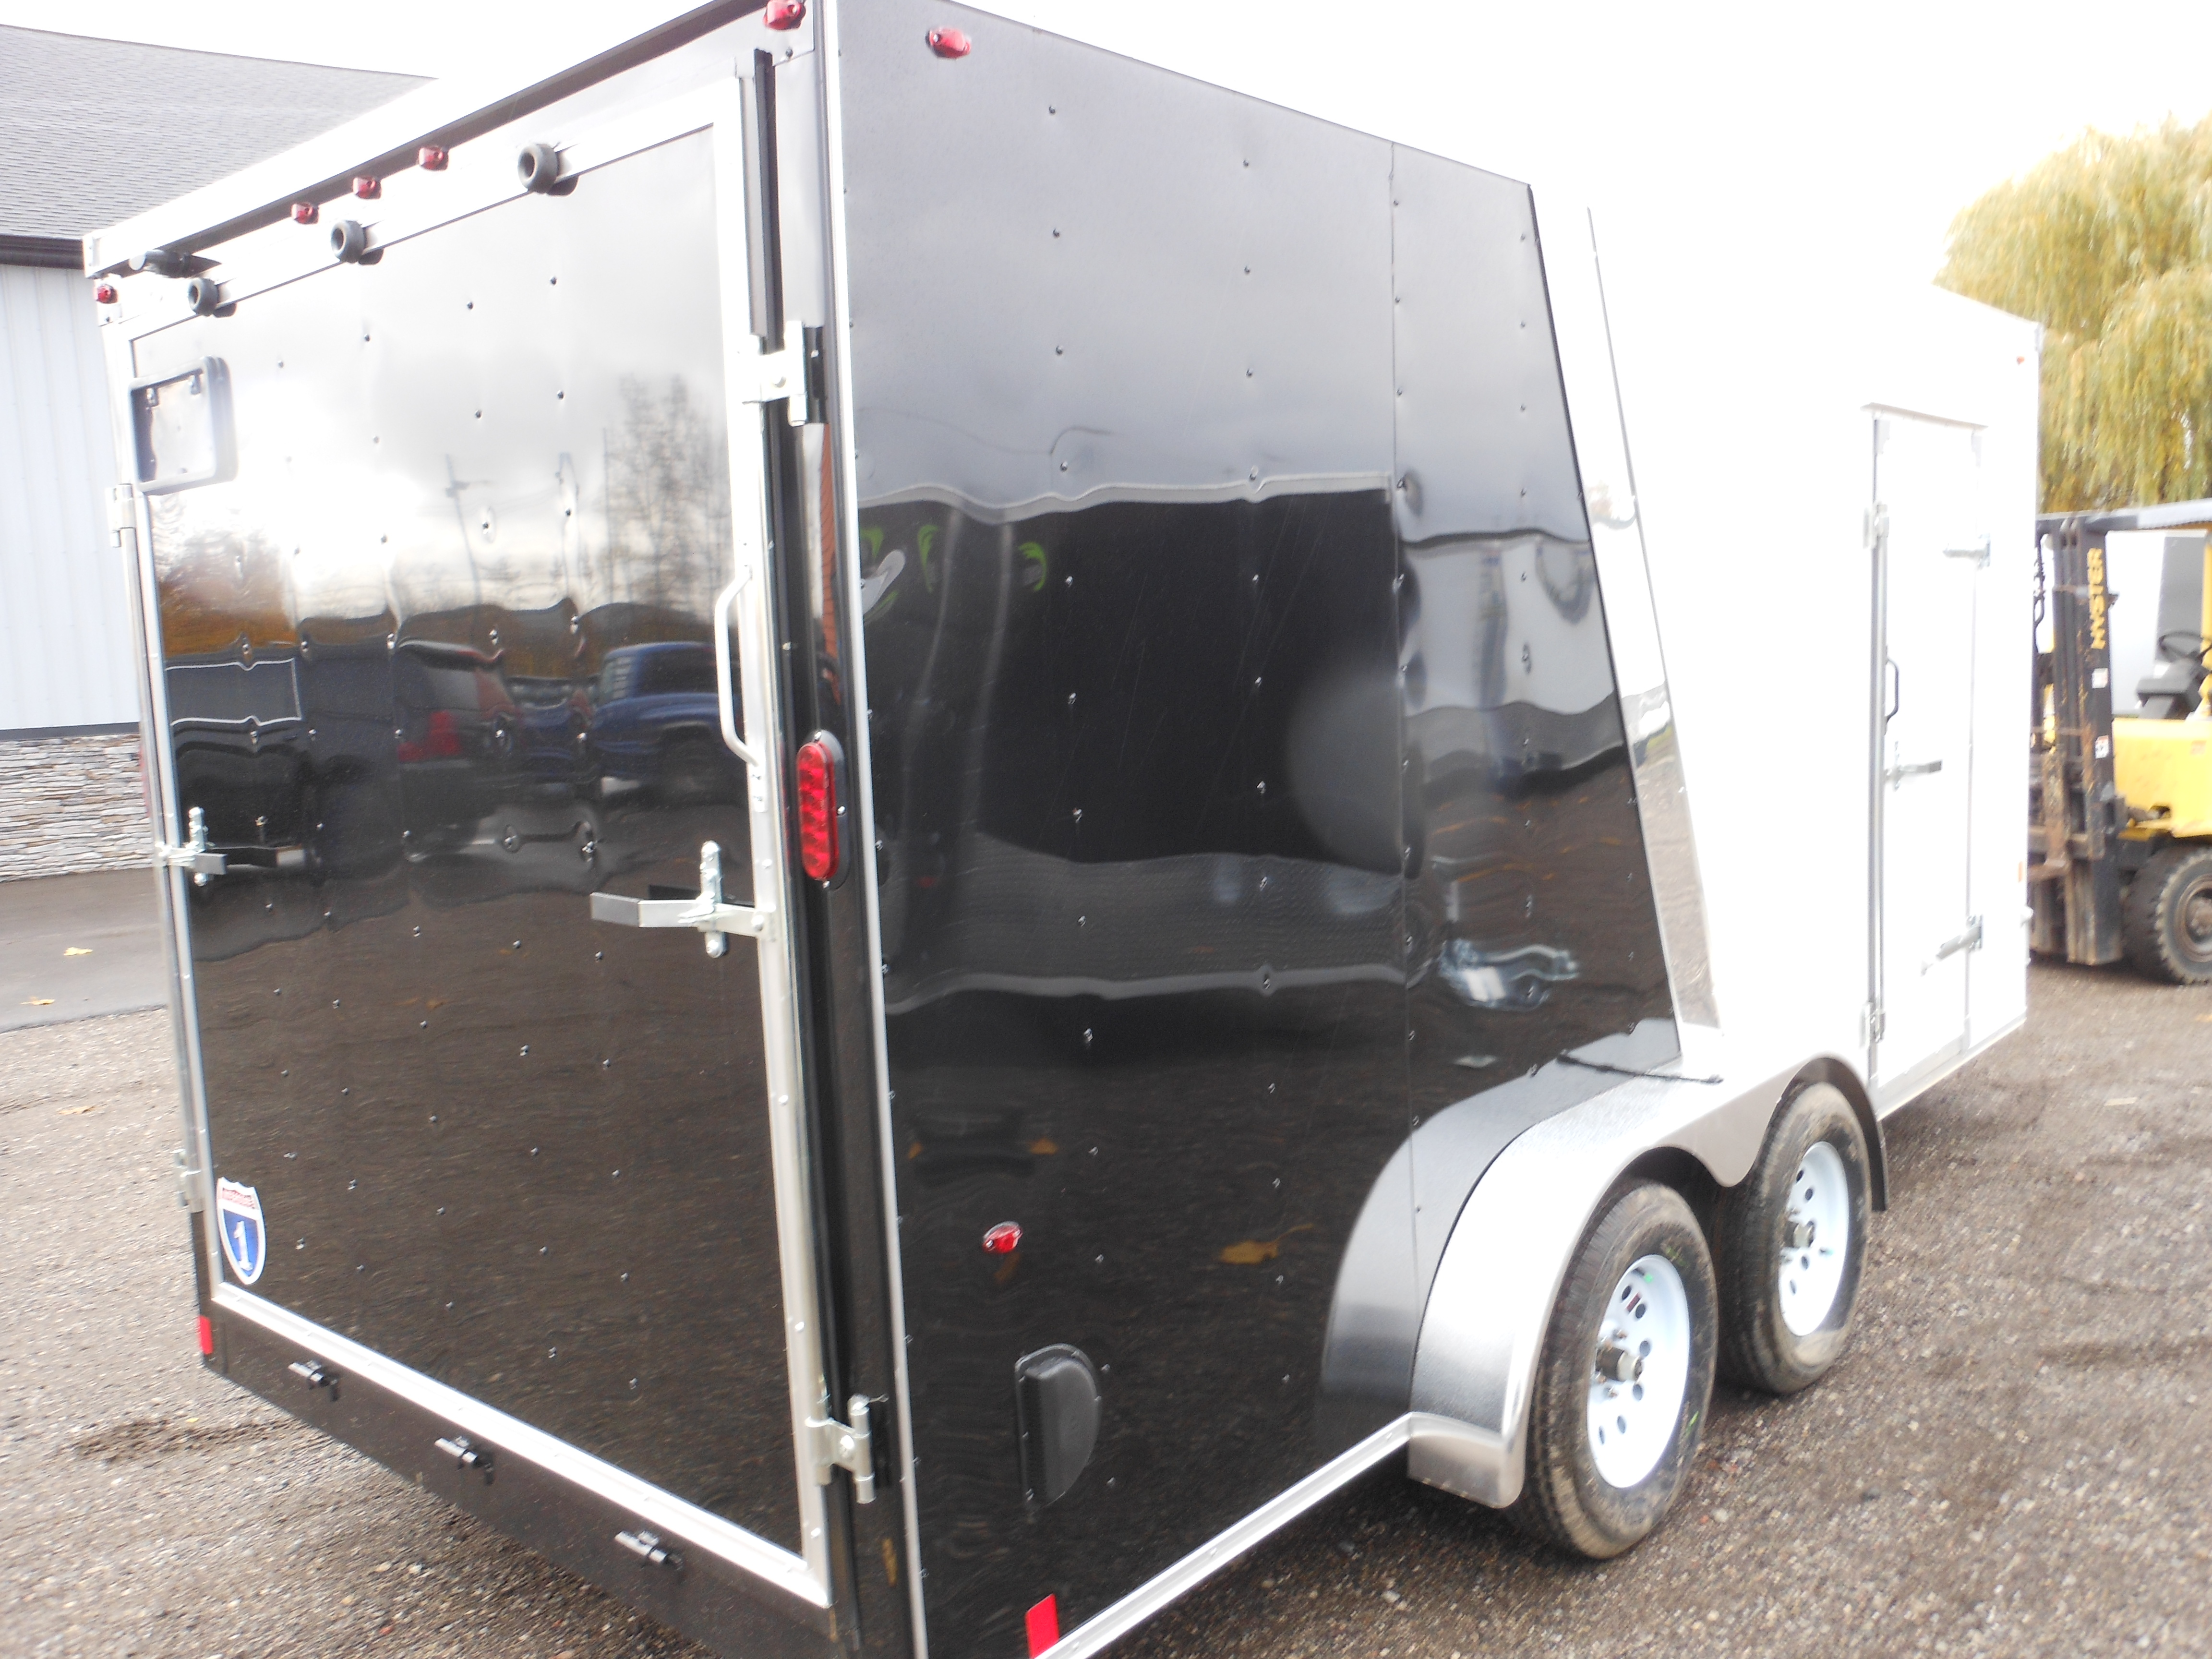 2019  7 X 16 Interstate-1 HD Enclosed Cargo Trailer full